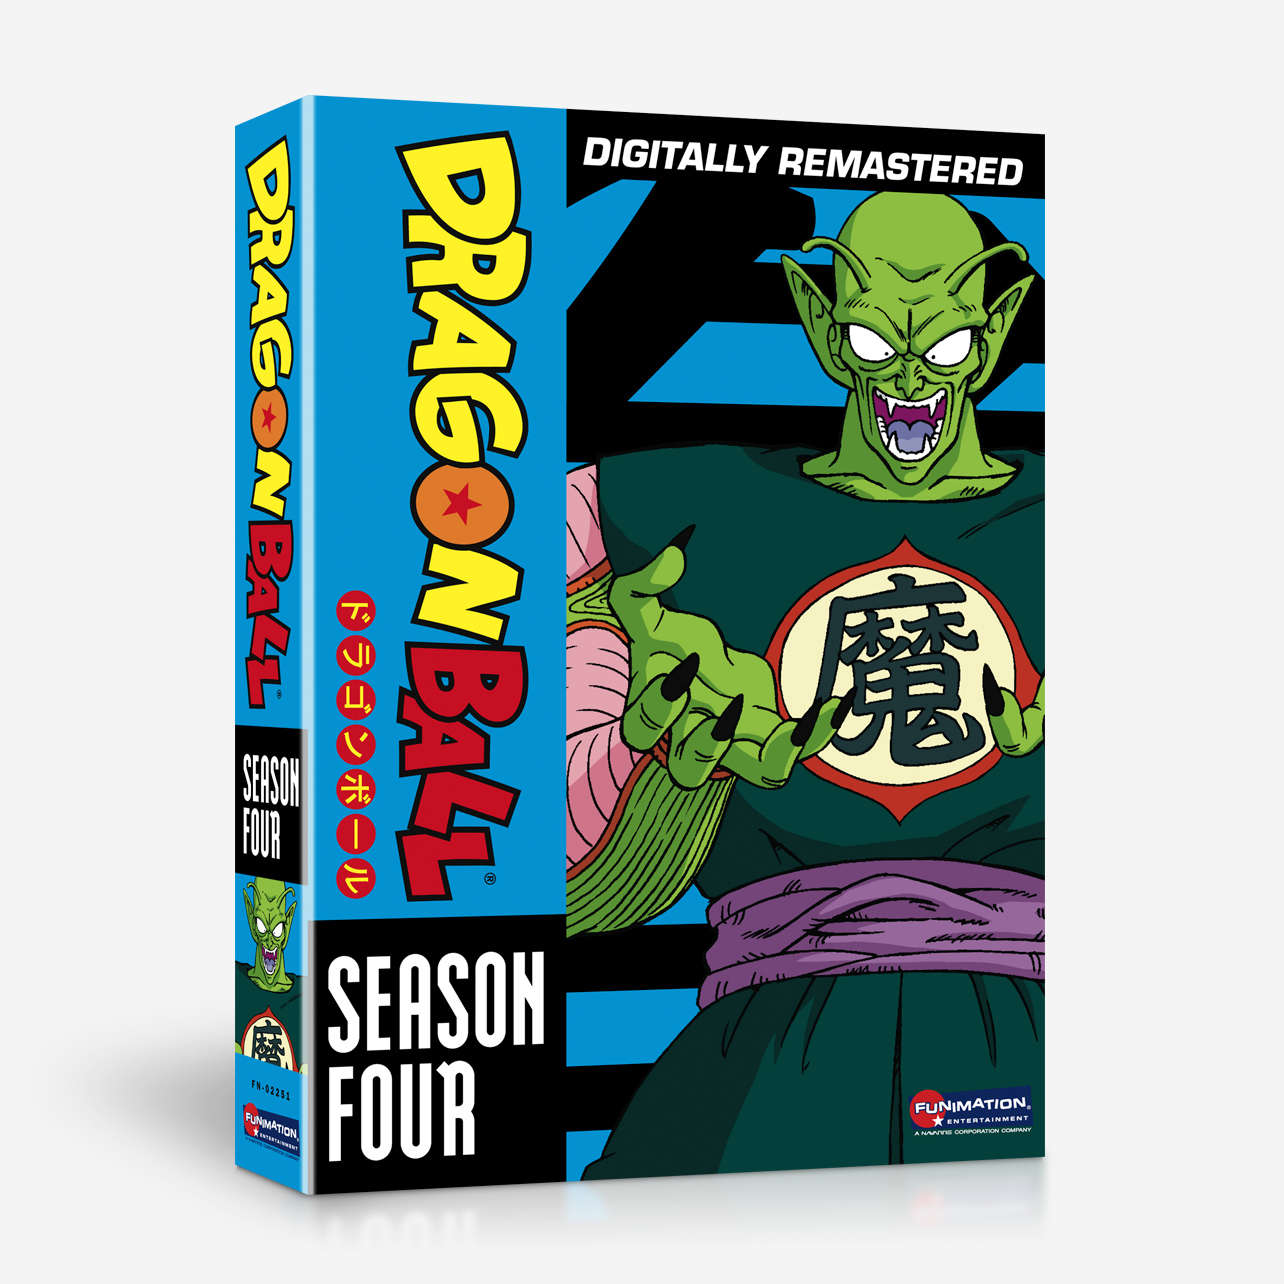 Season Four home-video